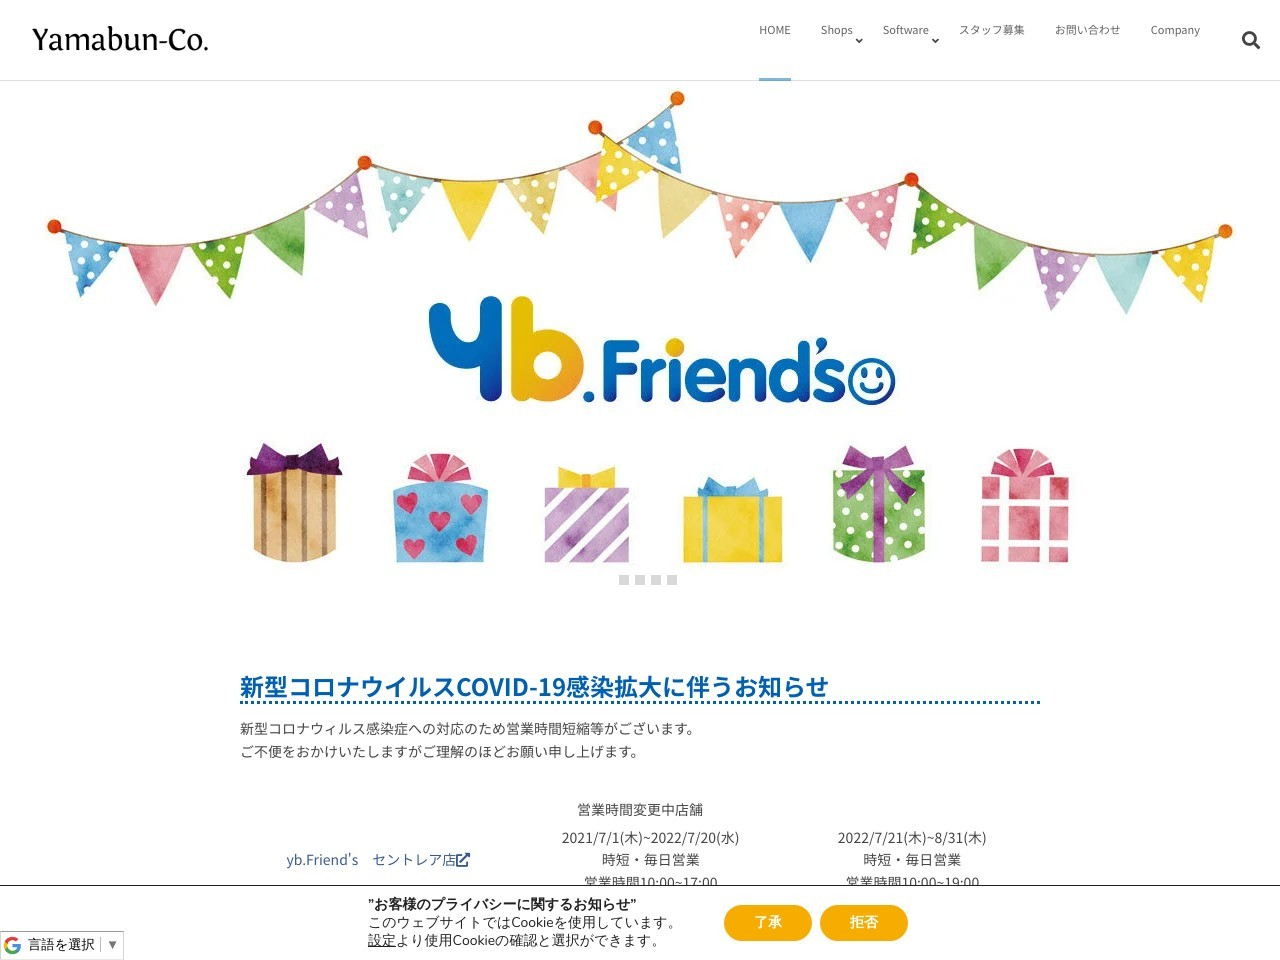 Yamabun-Co. ? 株式会社山文 ウェブサイト